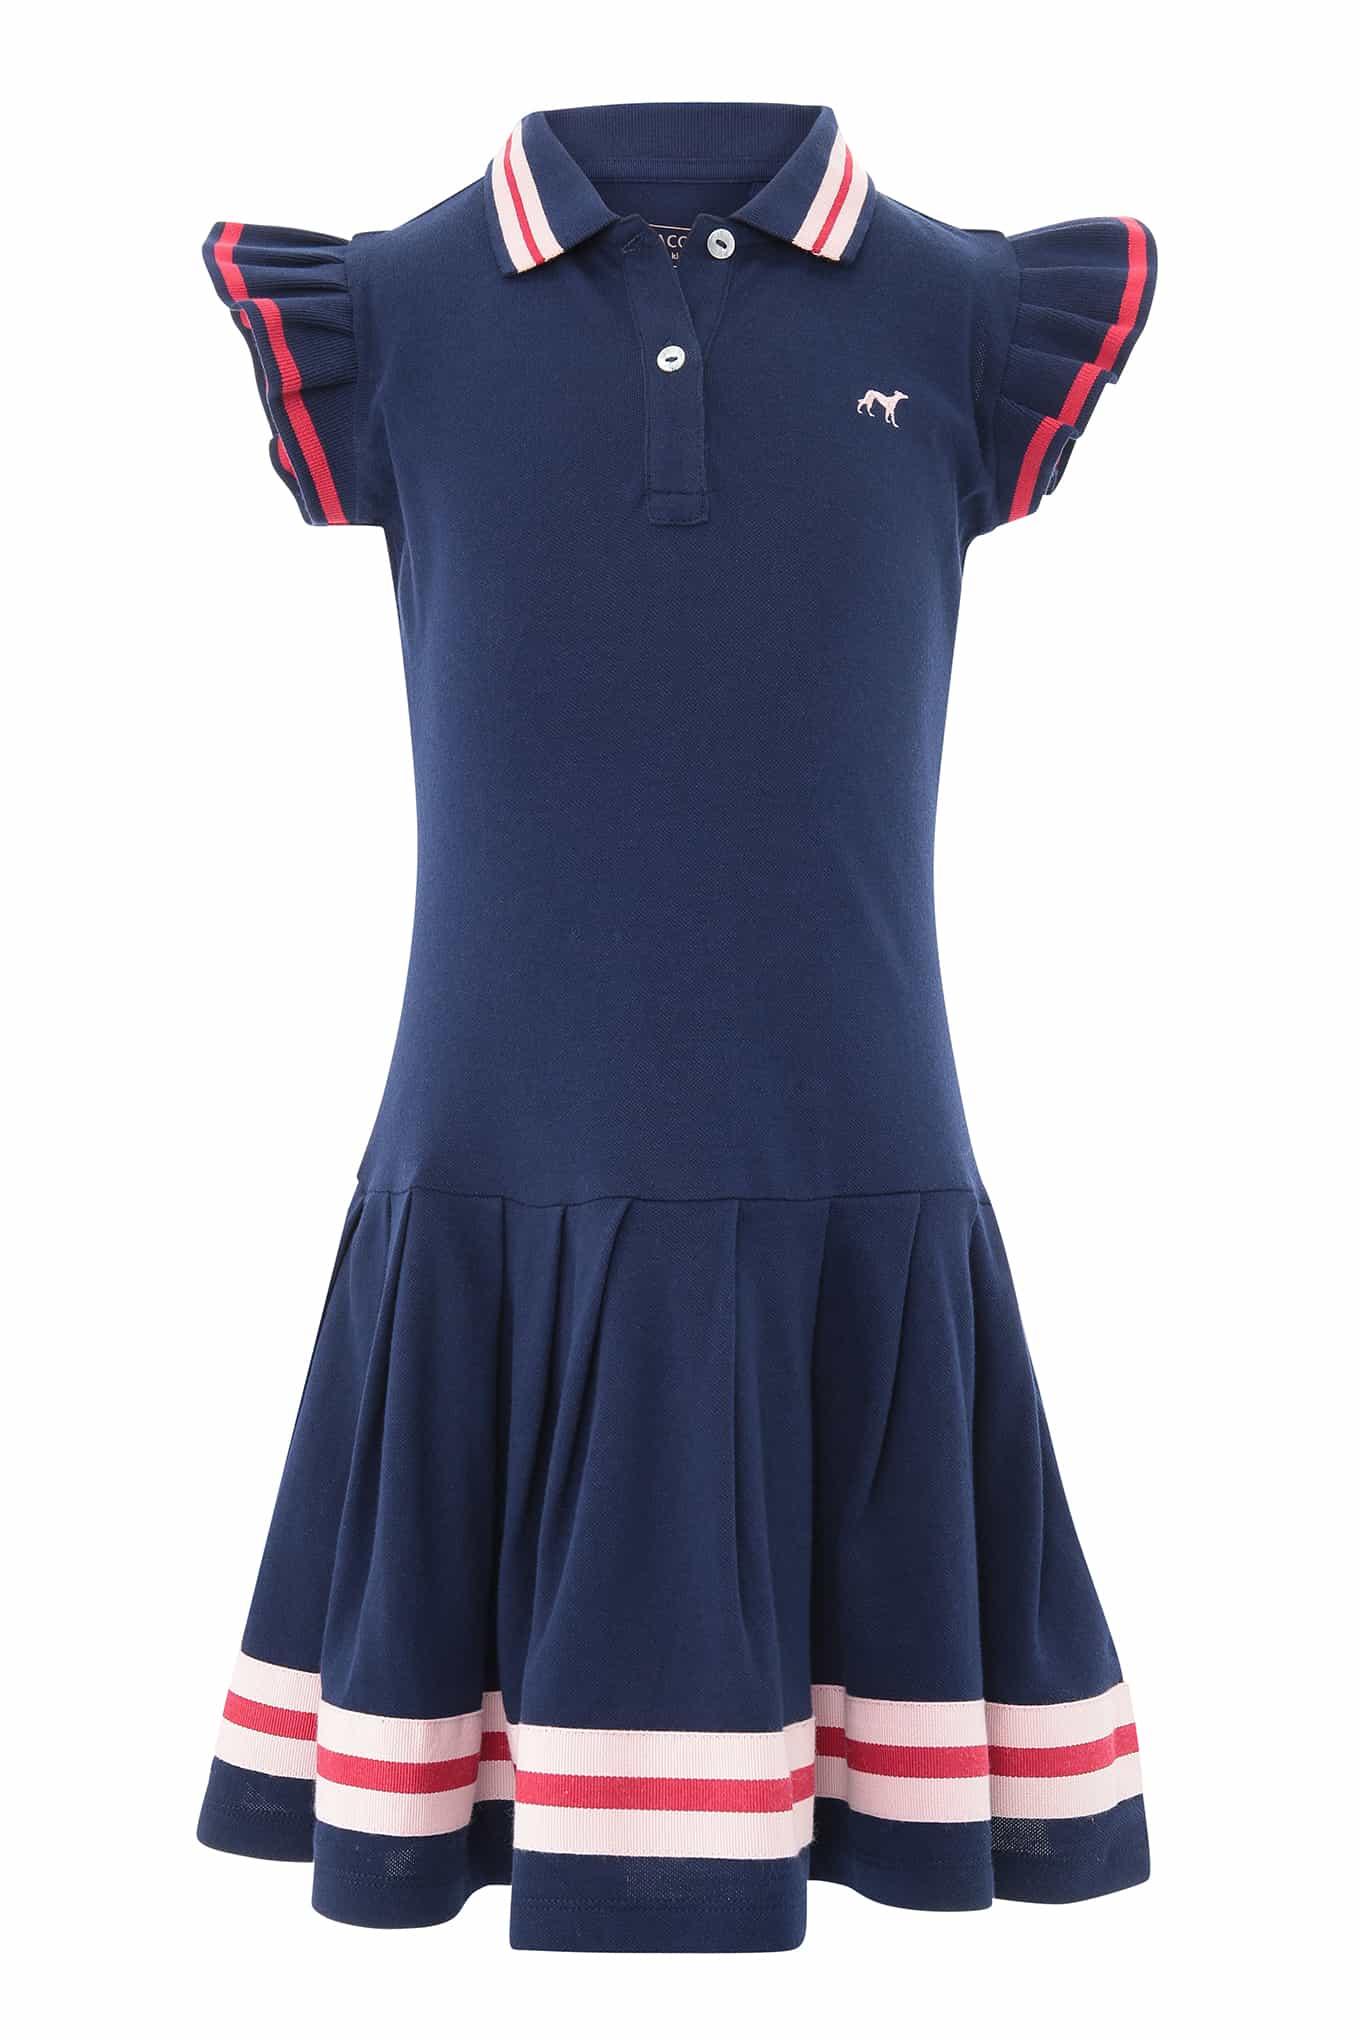 Vestido Piquet Azul Escuro Sport Rapariga